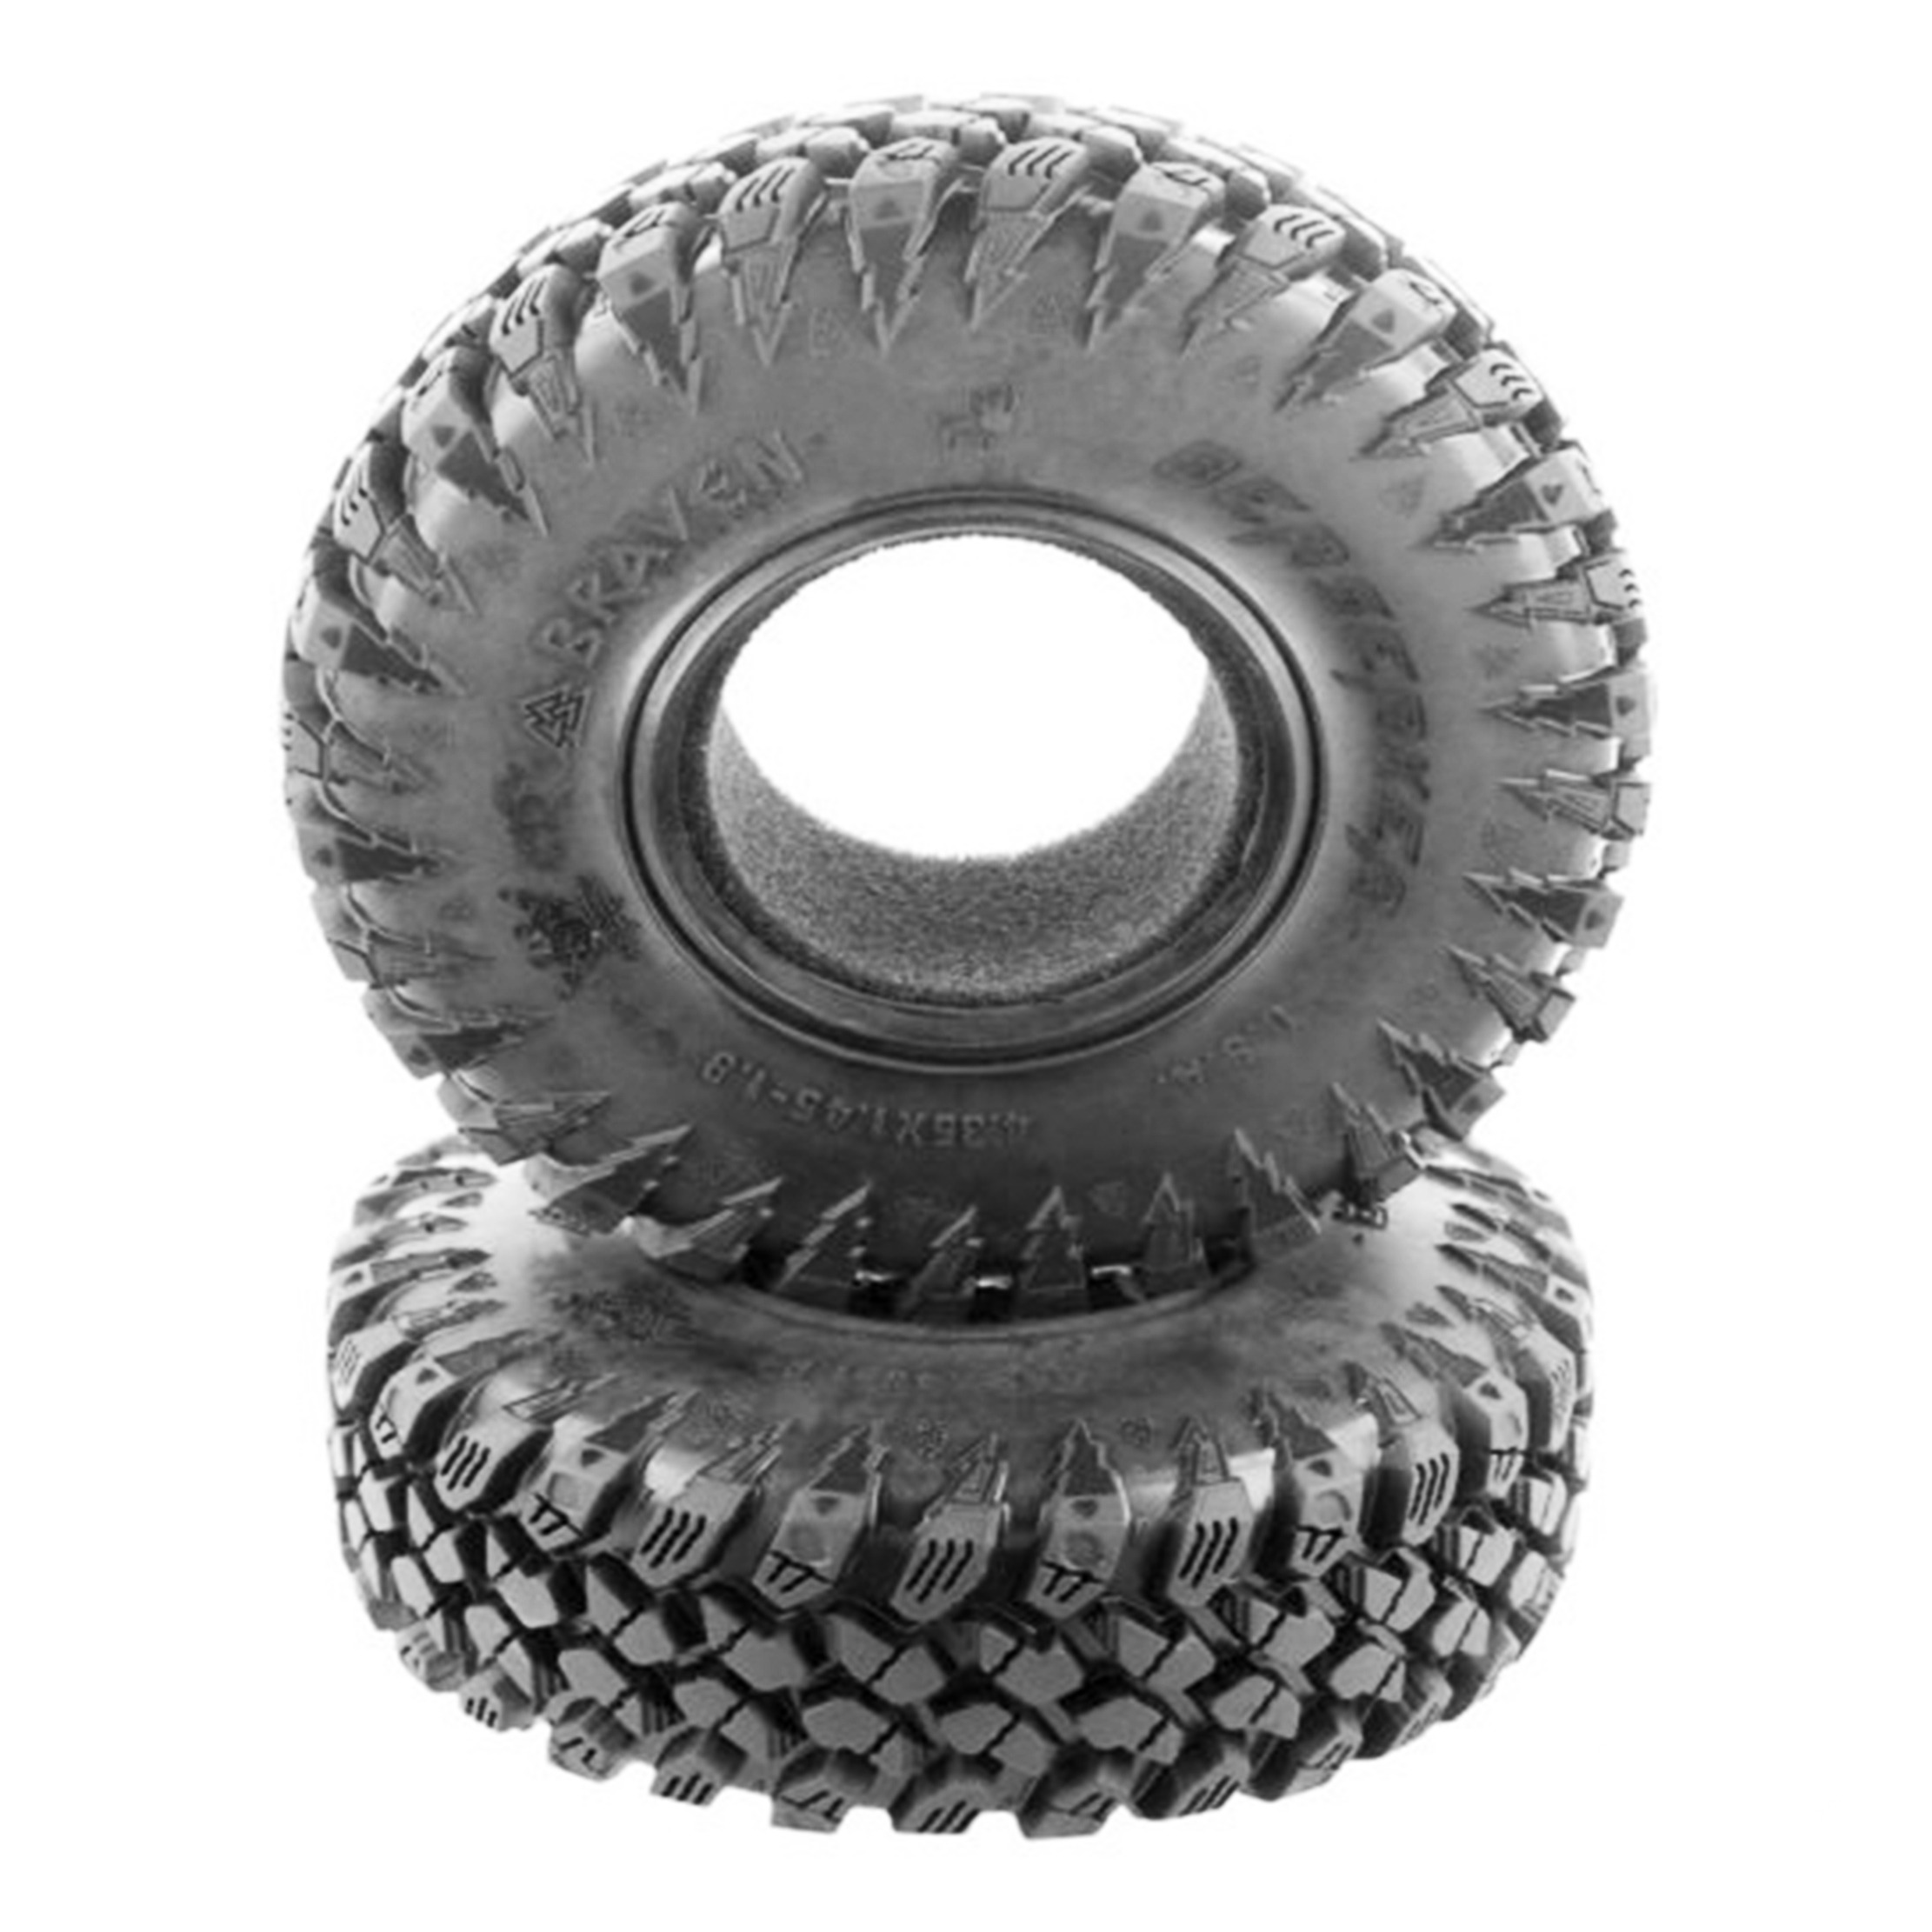 Neumáticos PitBull Braven Berserker 1.9 Scale Tire Alien Compound con Foam (2 piezas)